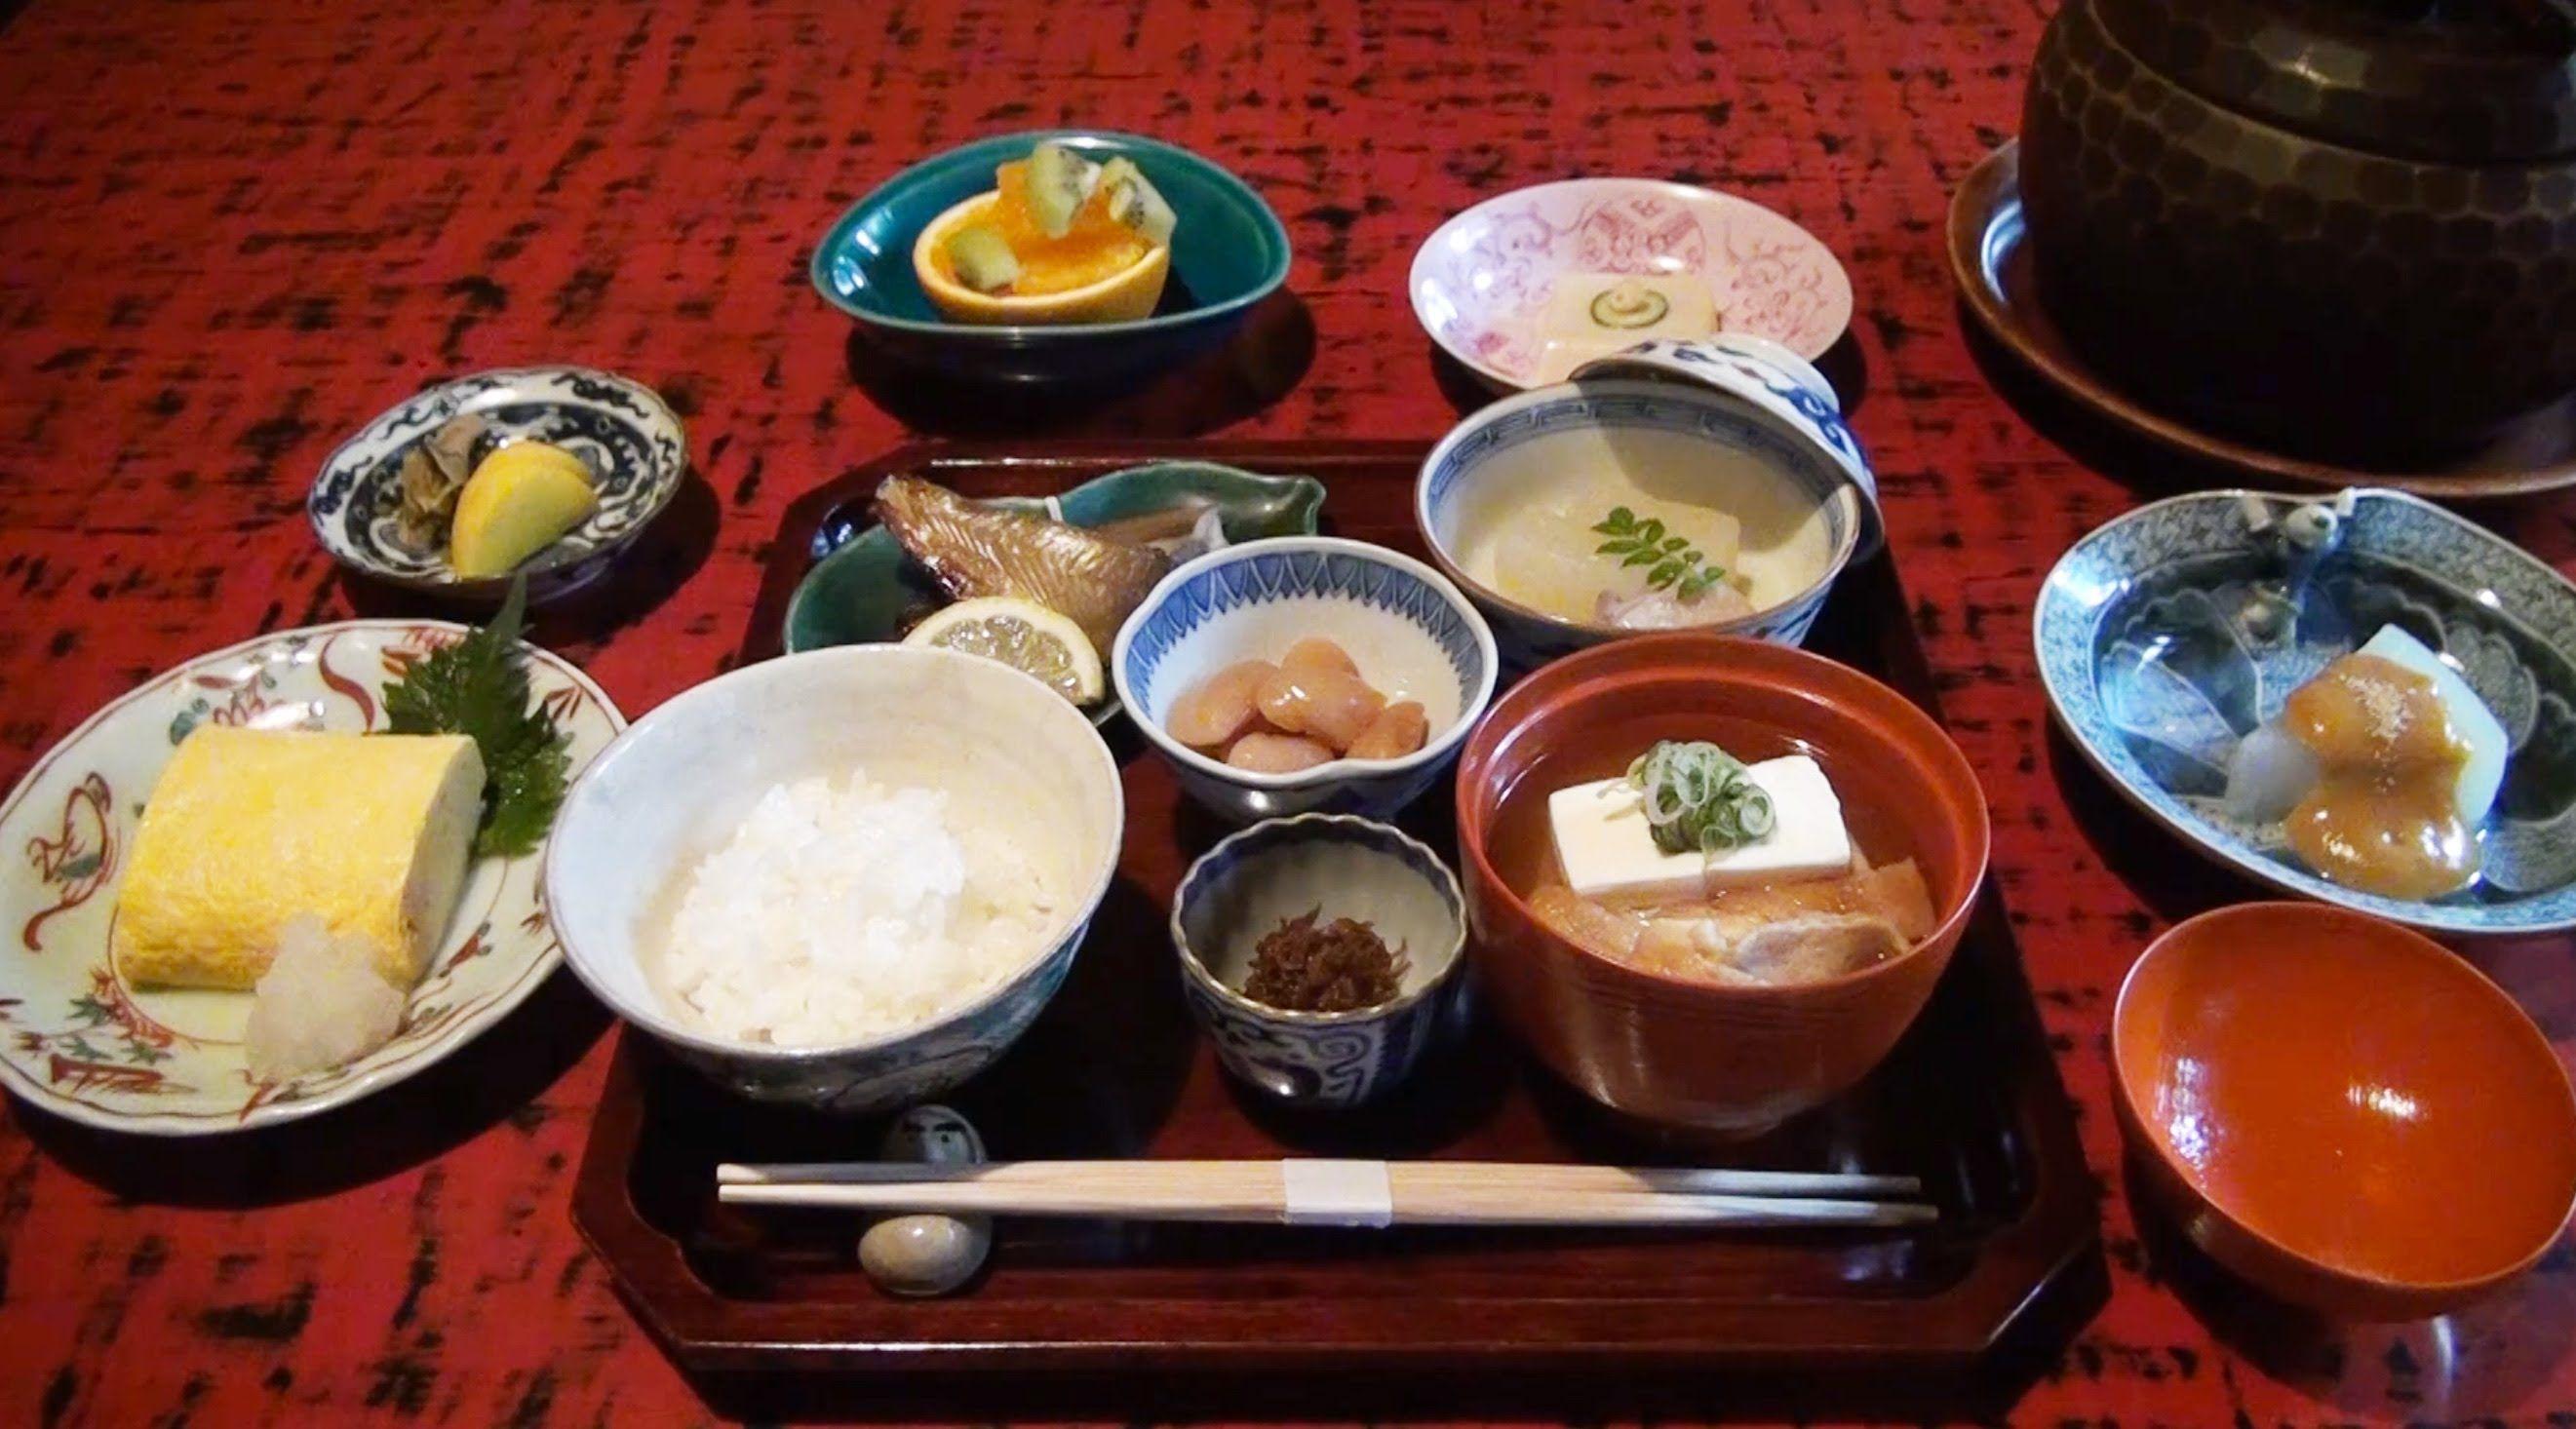 Breakfast of Traditional restaurant, 懐石 近又. Need reservation. Web site : http://www.kinmata.com/